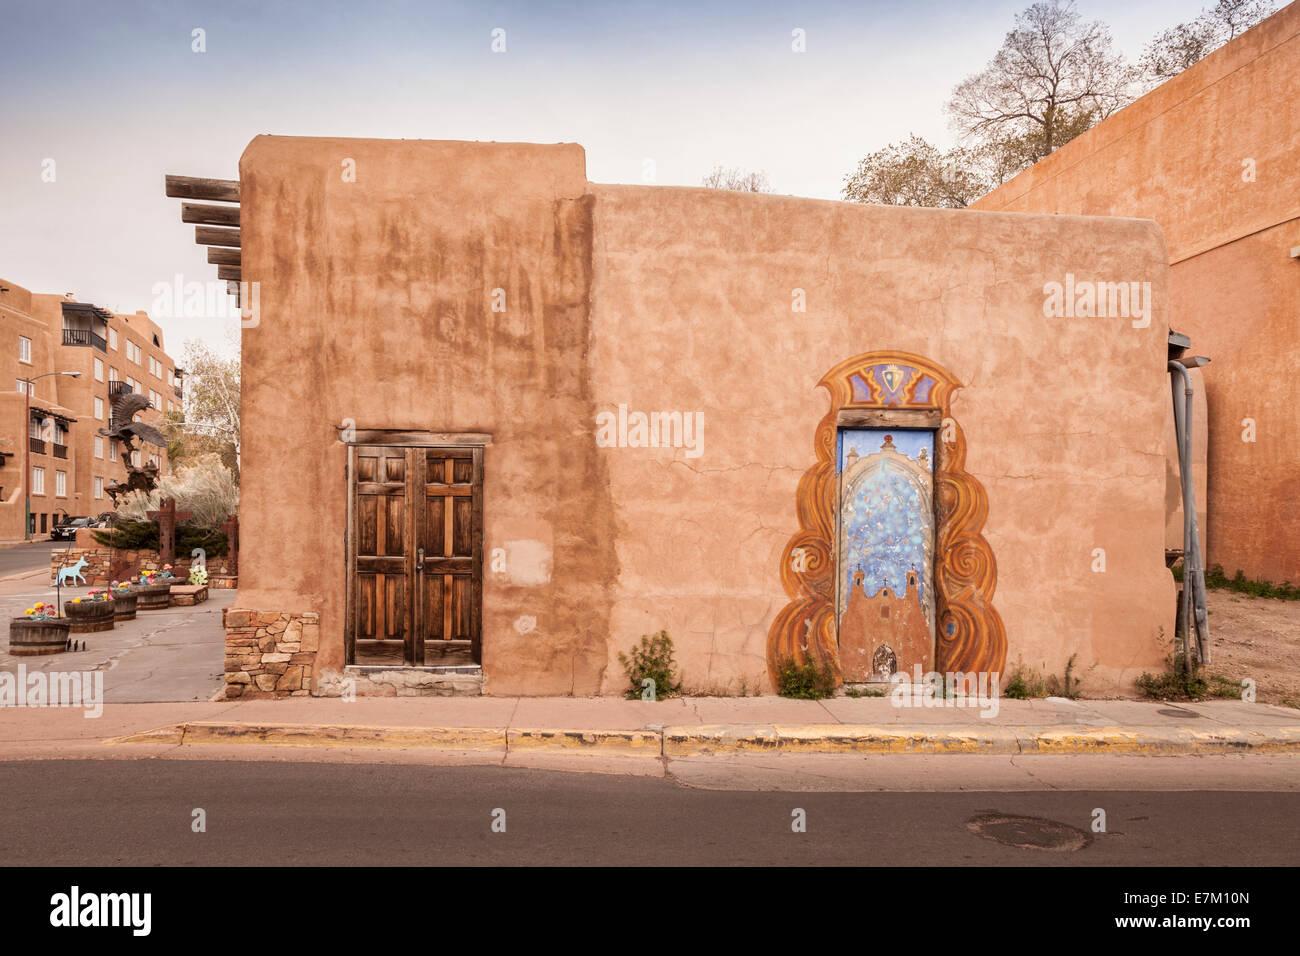 A traditional adobe house in santa fe new mexico stock for Santa fe adobe homes